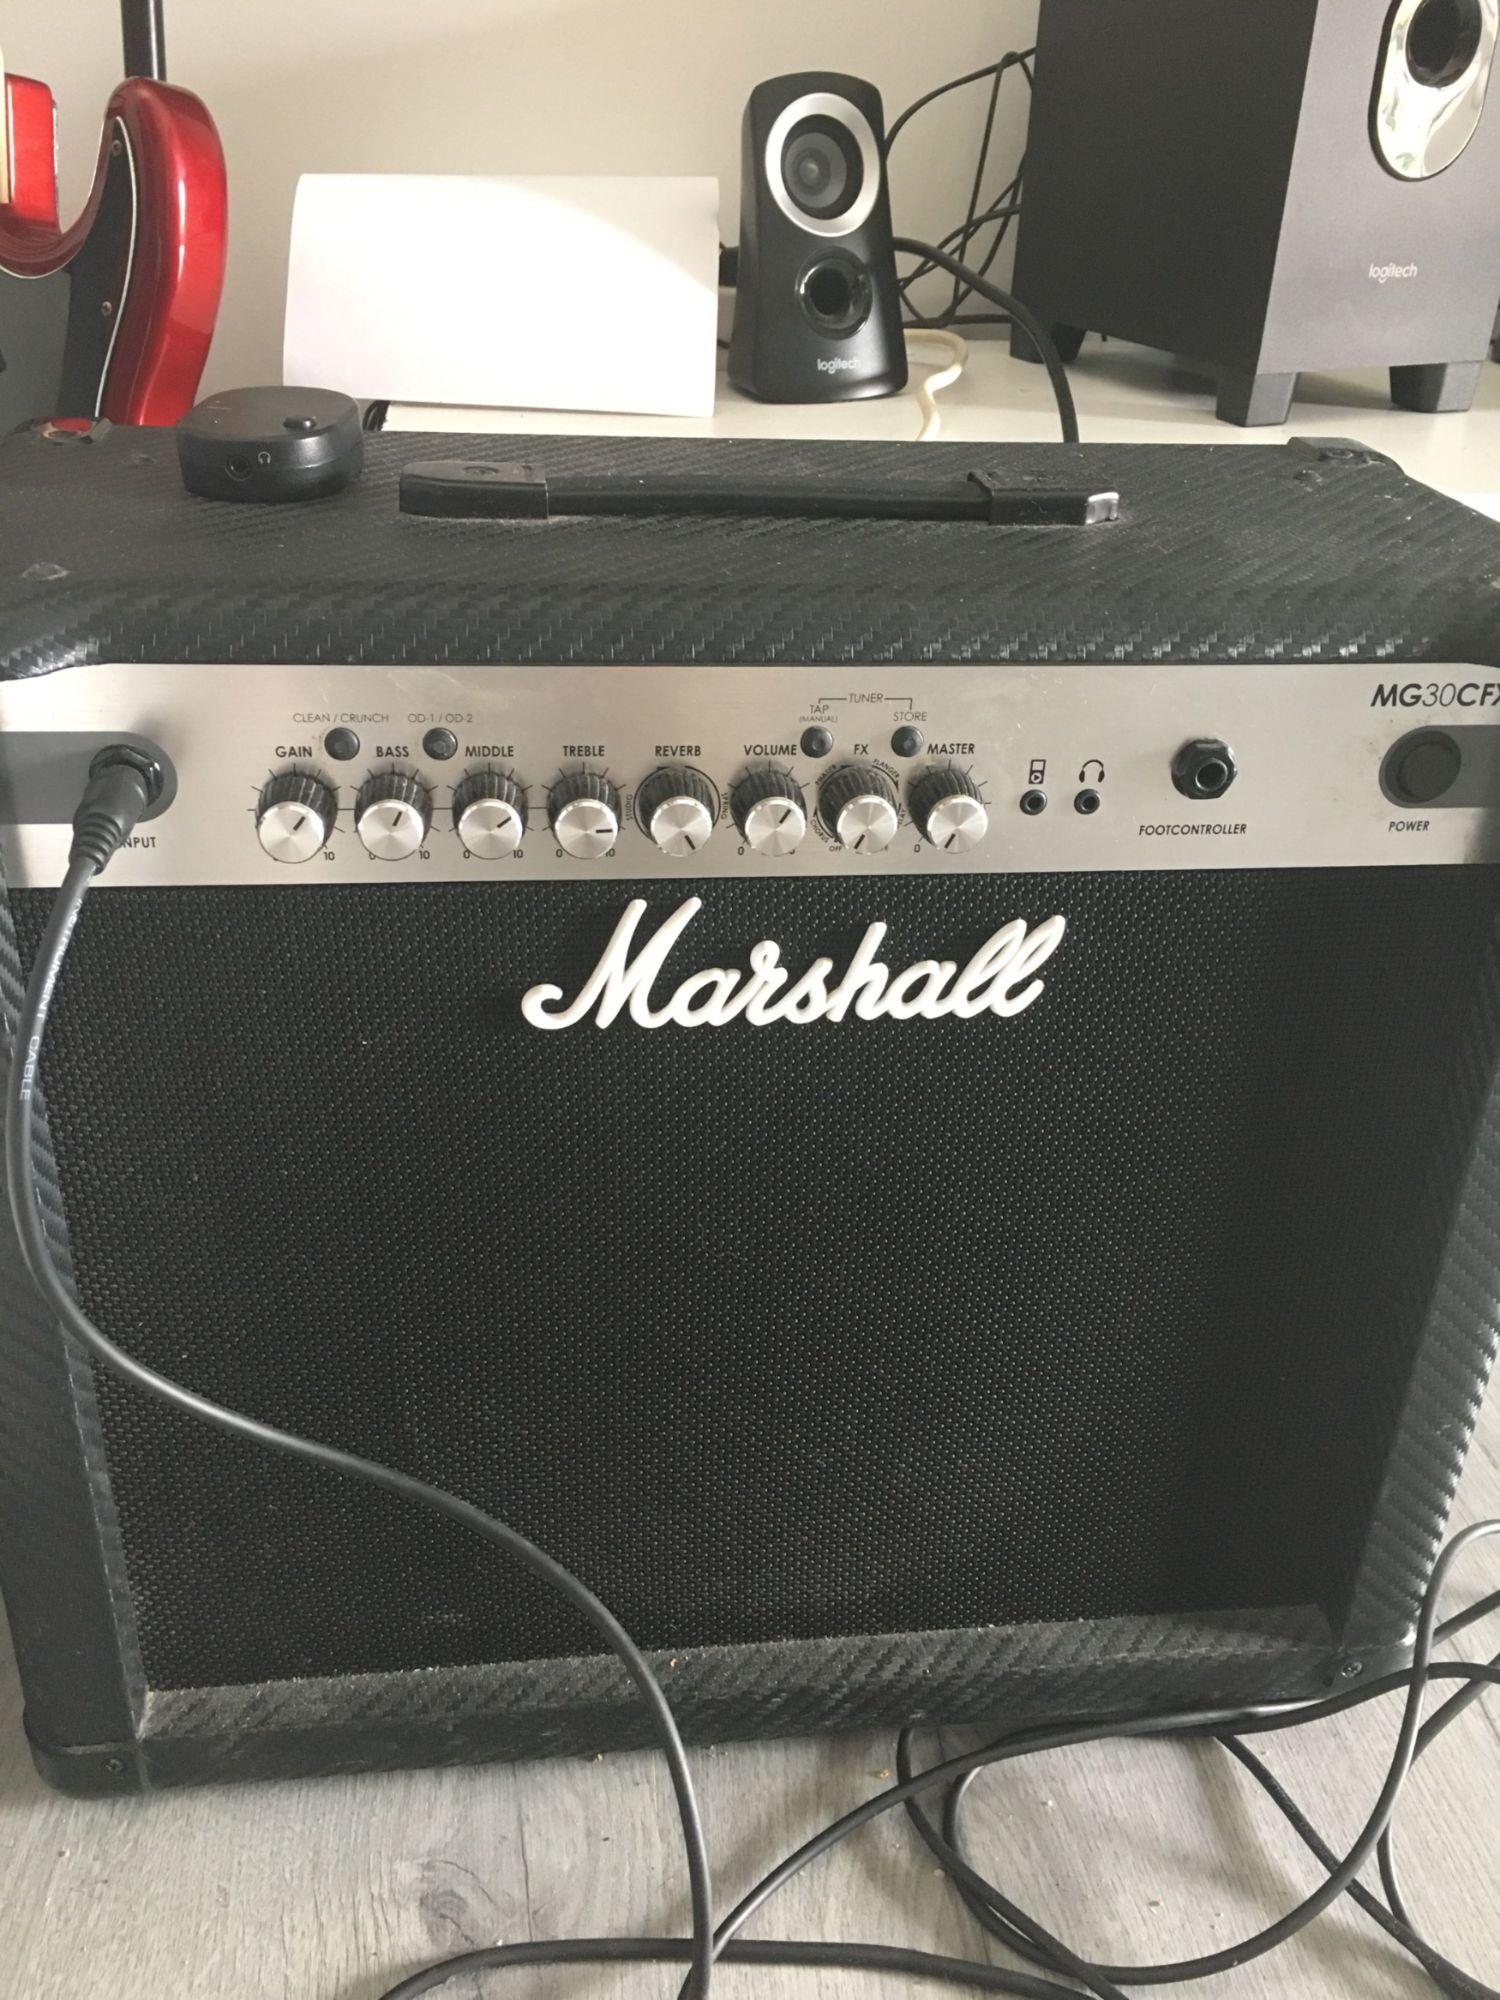 Vente Marshall Marshall Mg30fx